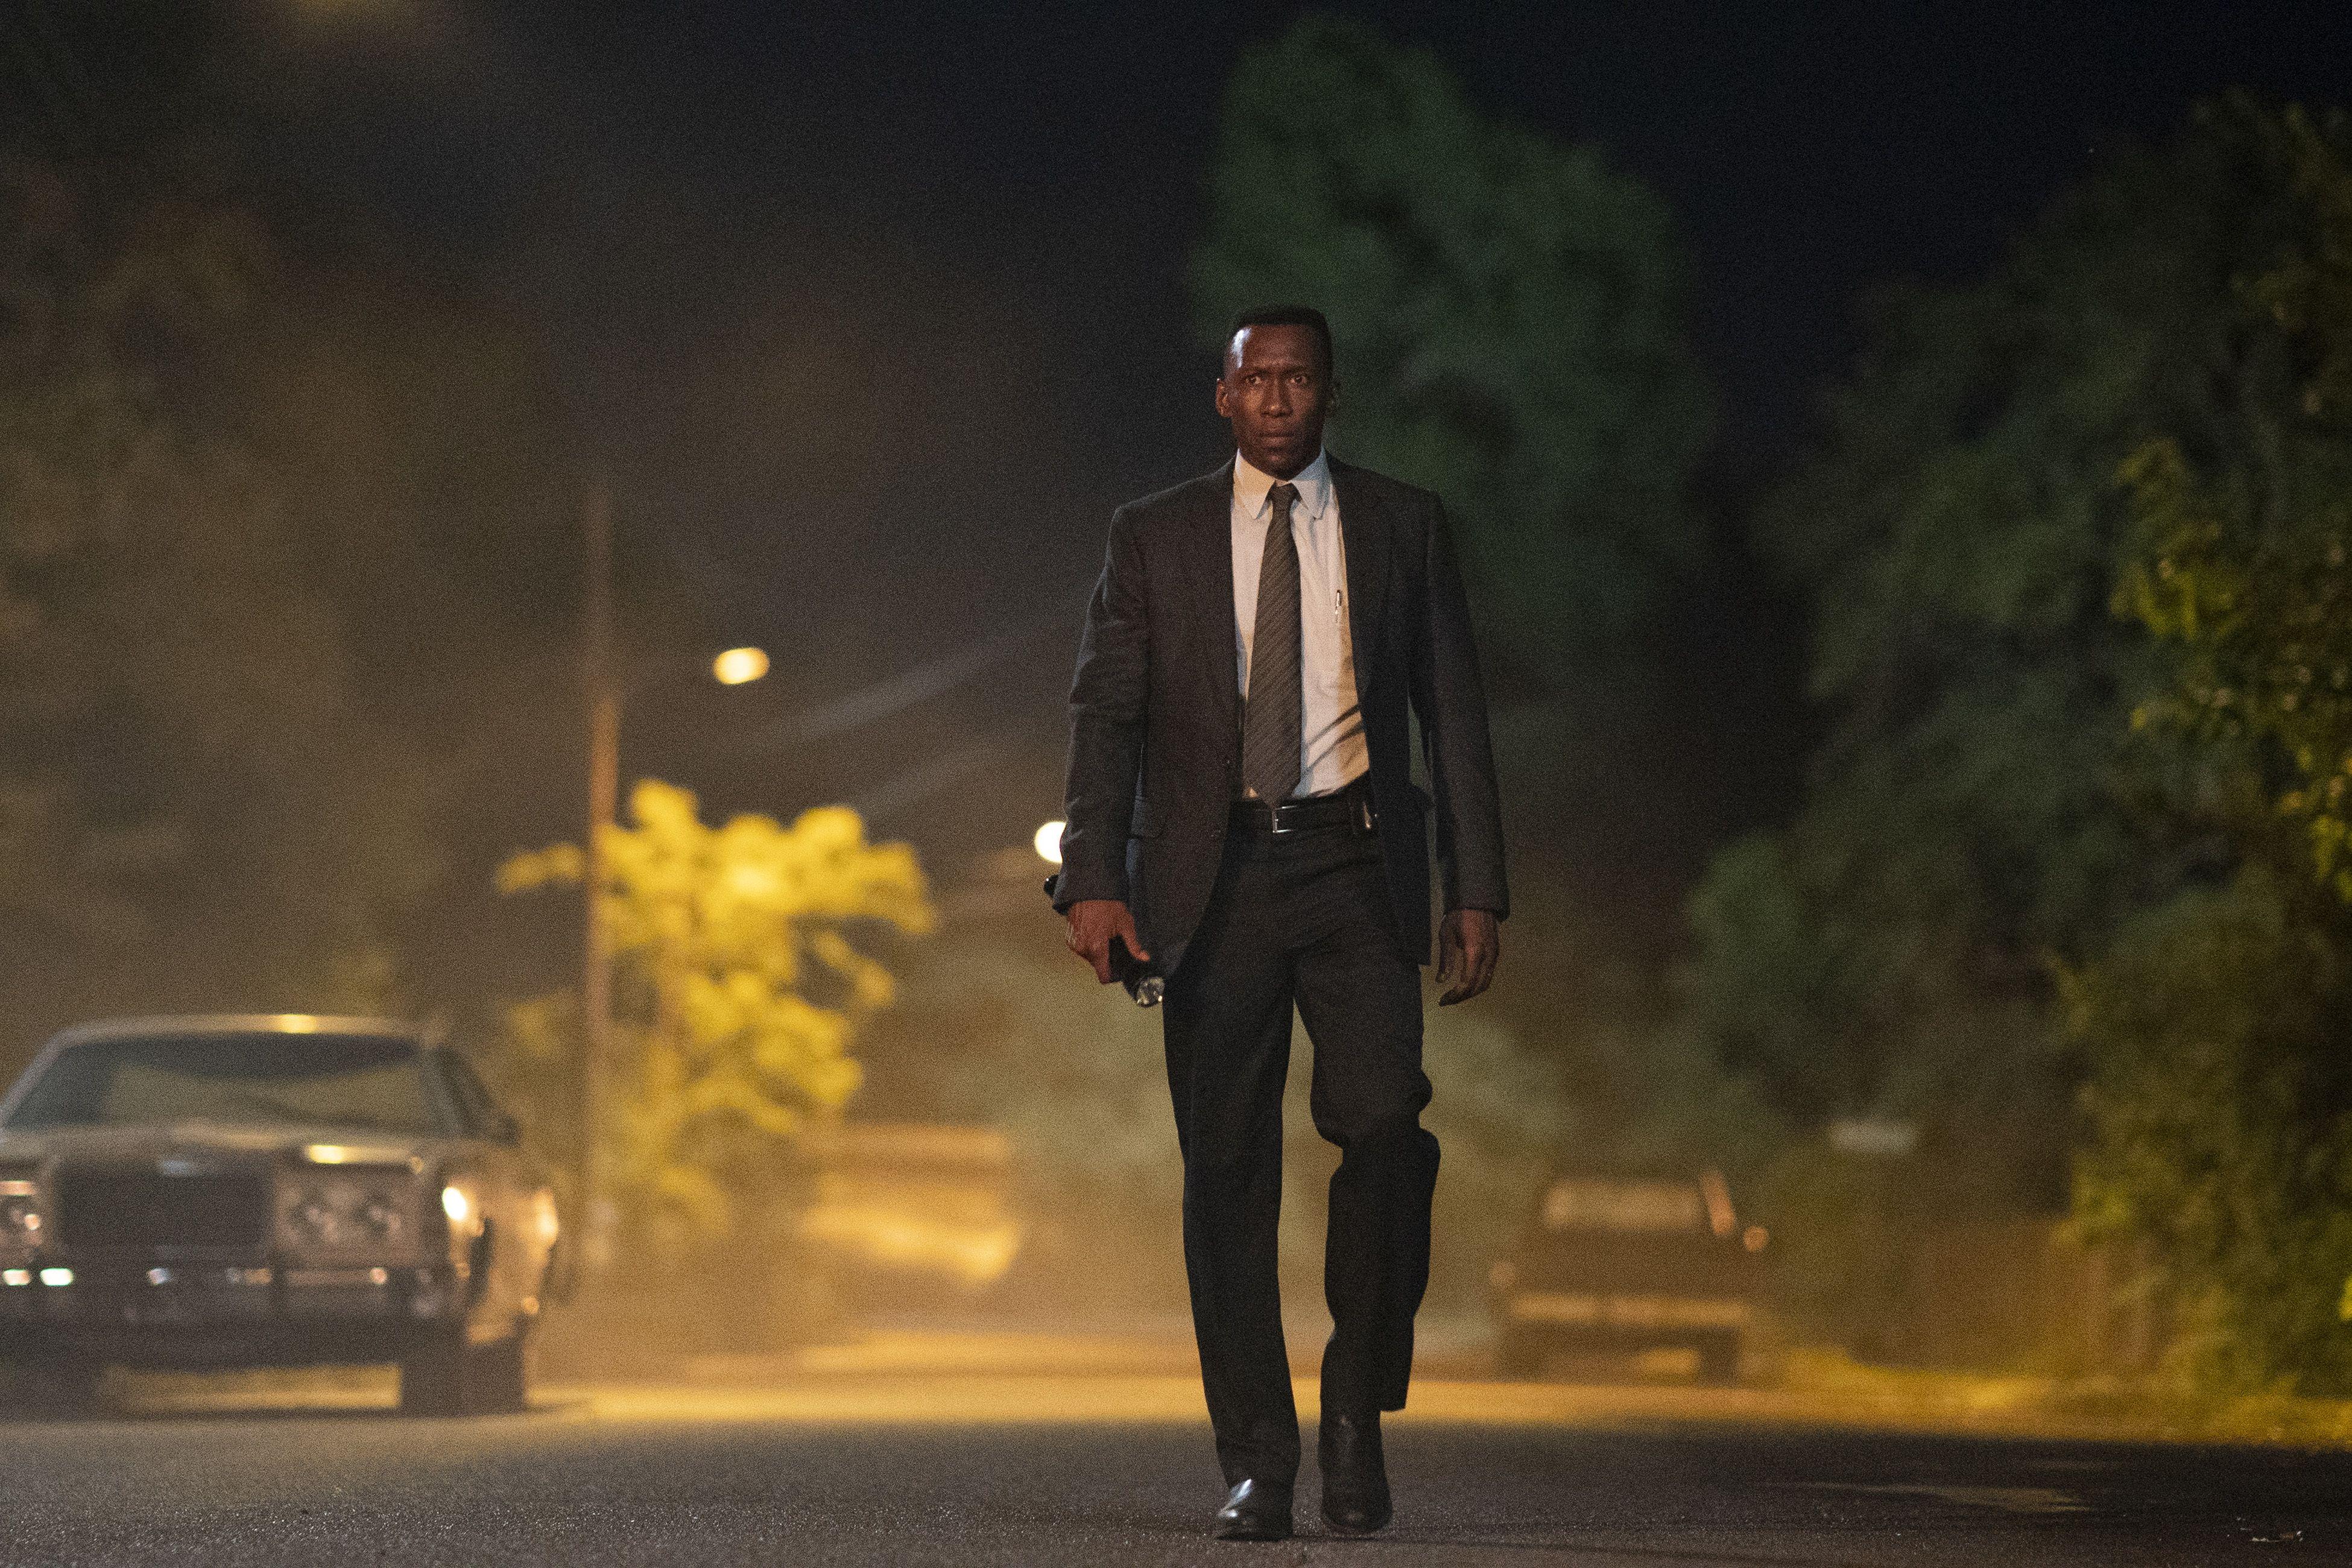 True Detective Season 3 Episode 6 Twist Explained - True Detective's